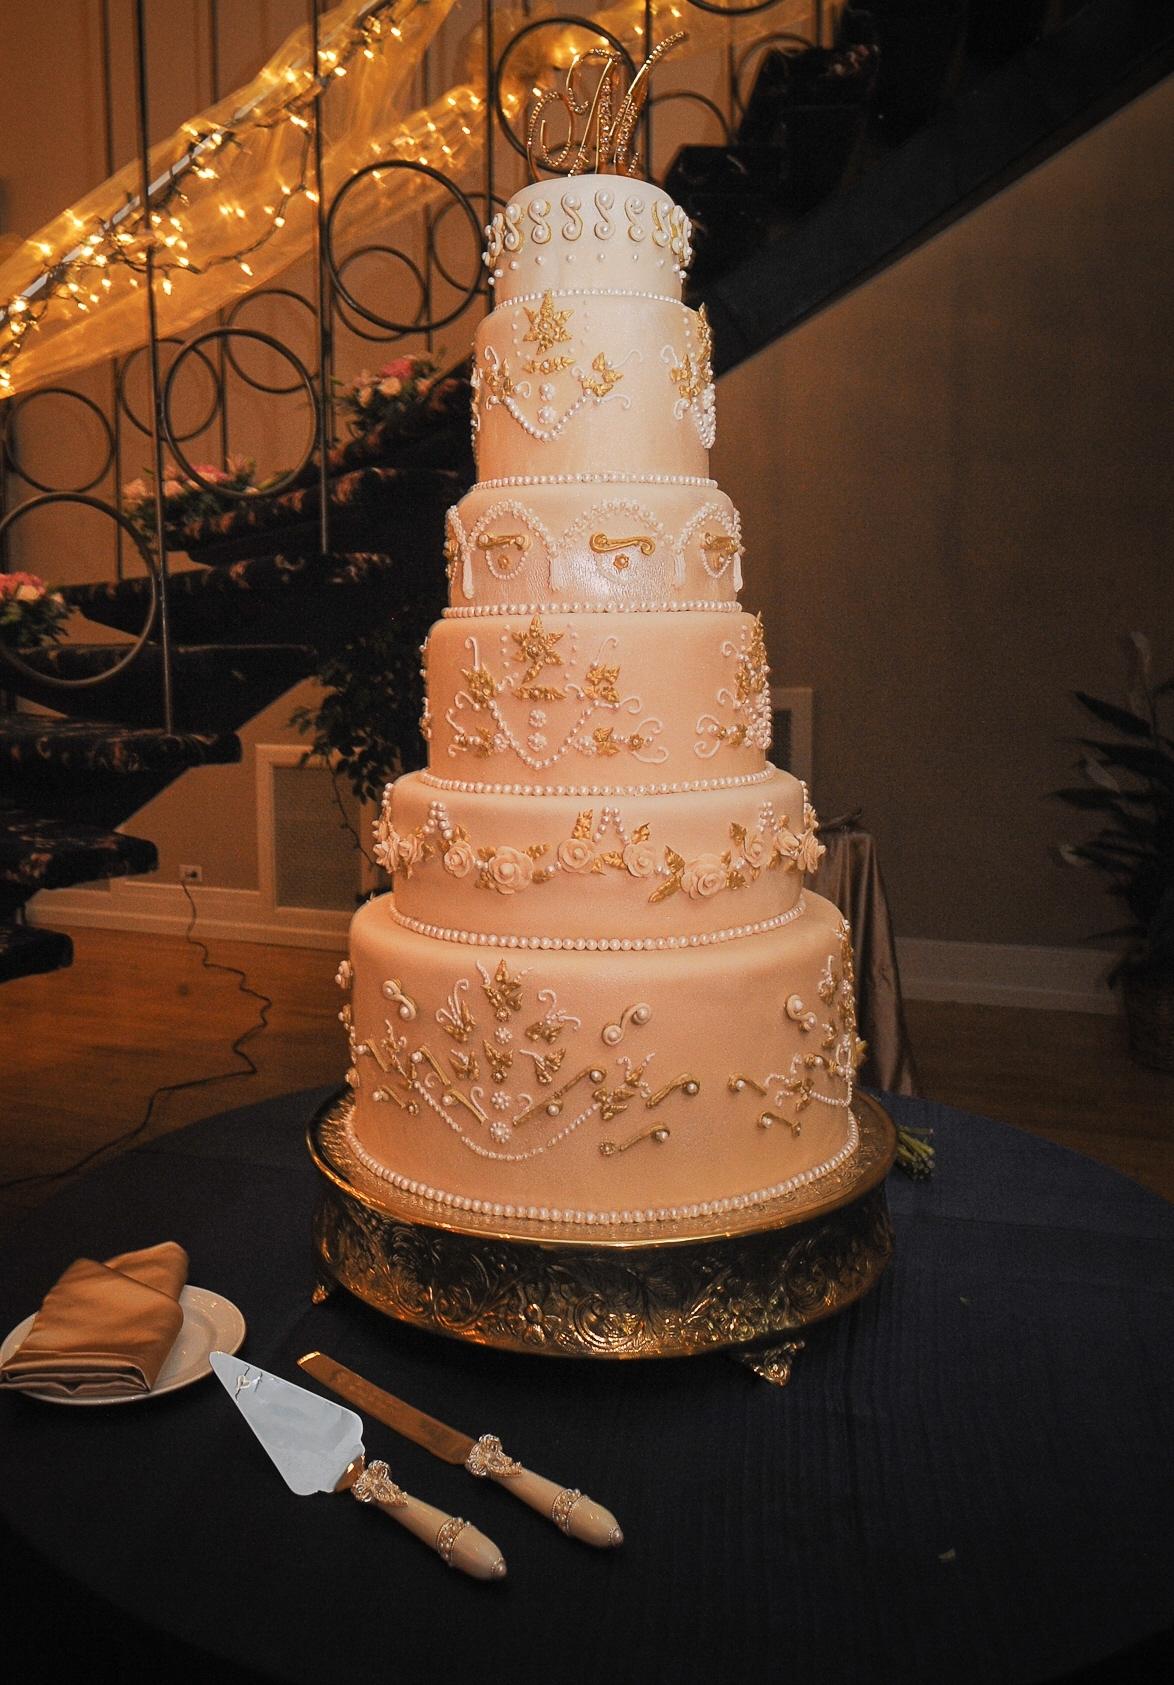 Victoria Wedding Cake Onewed Com